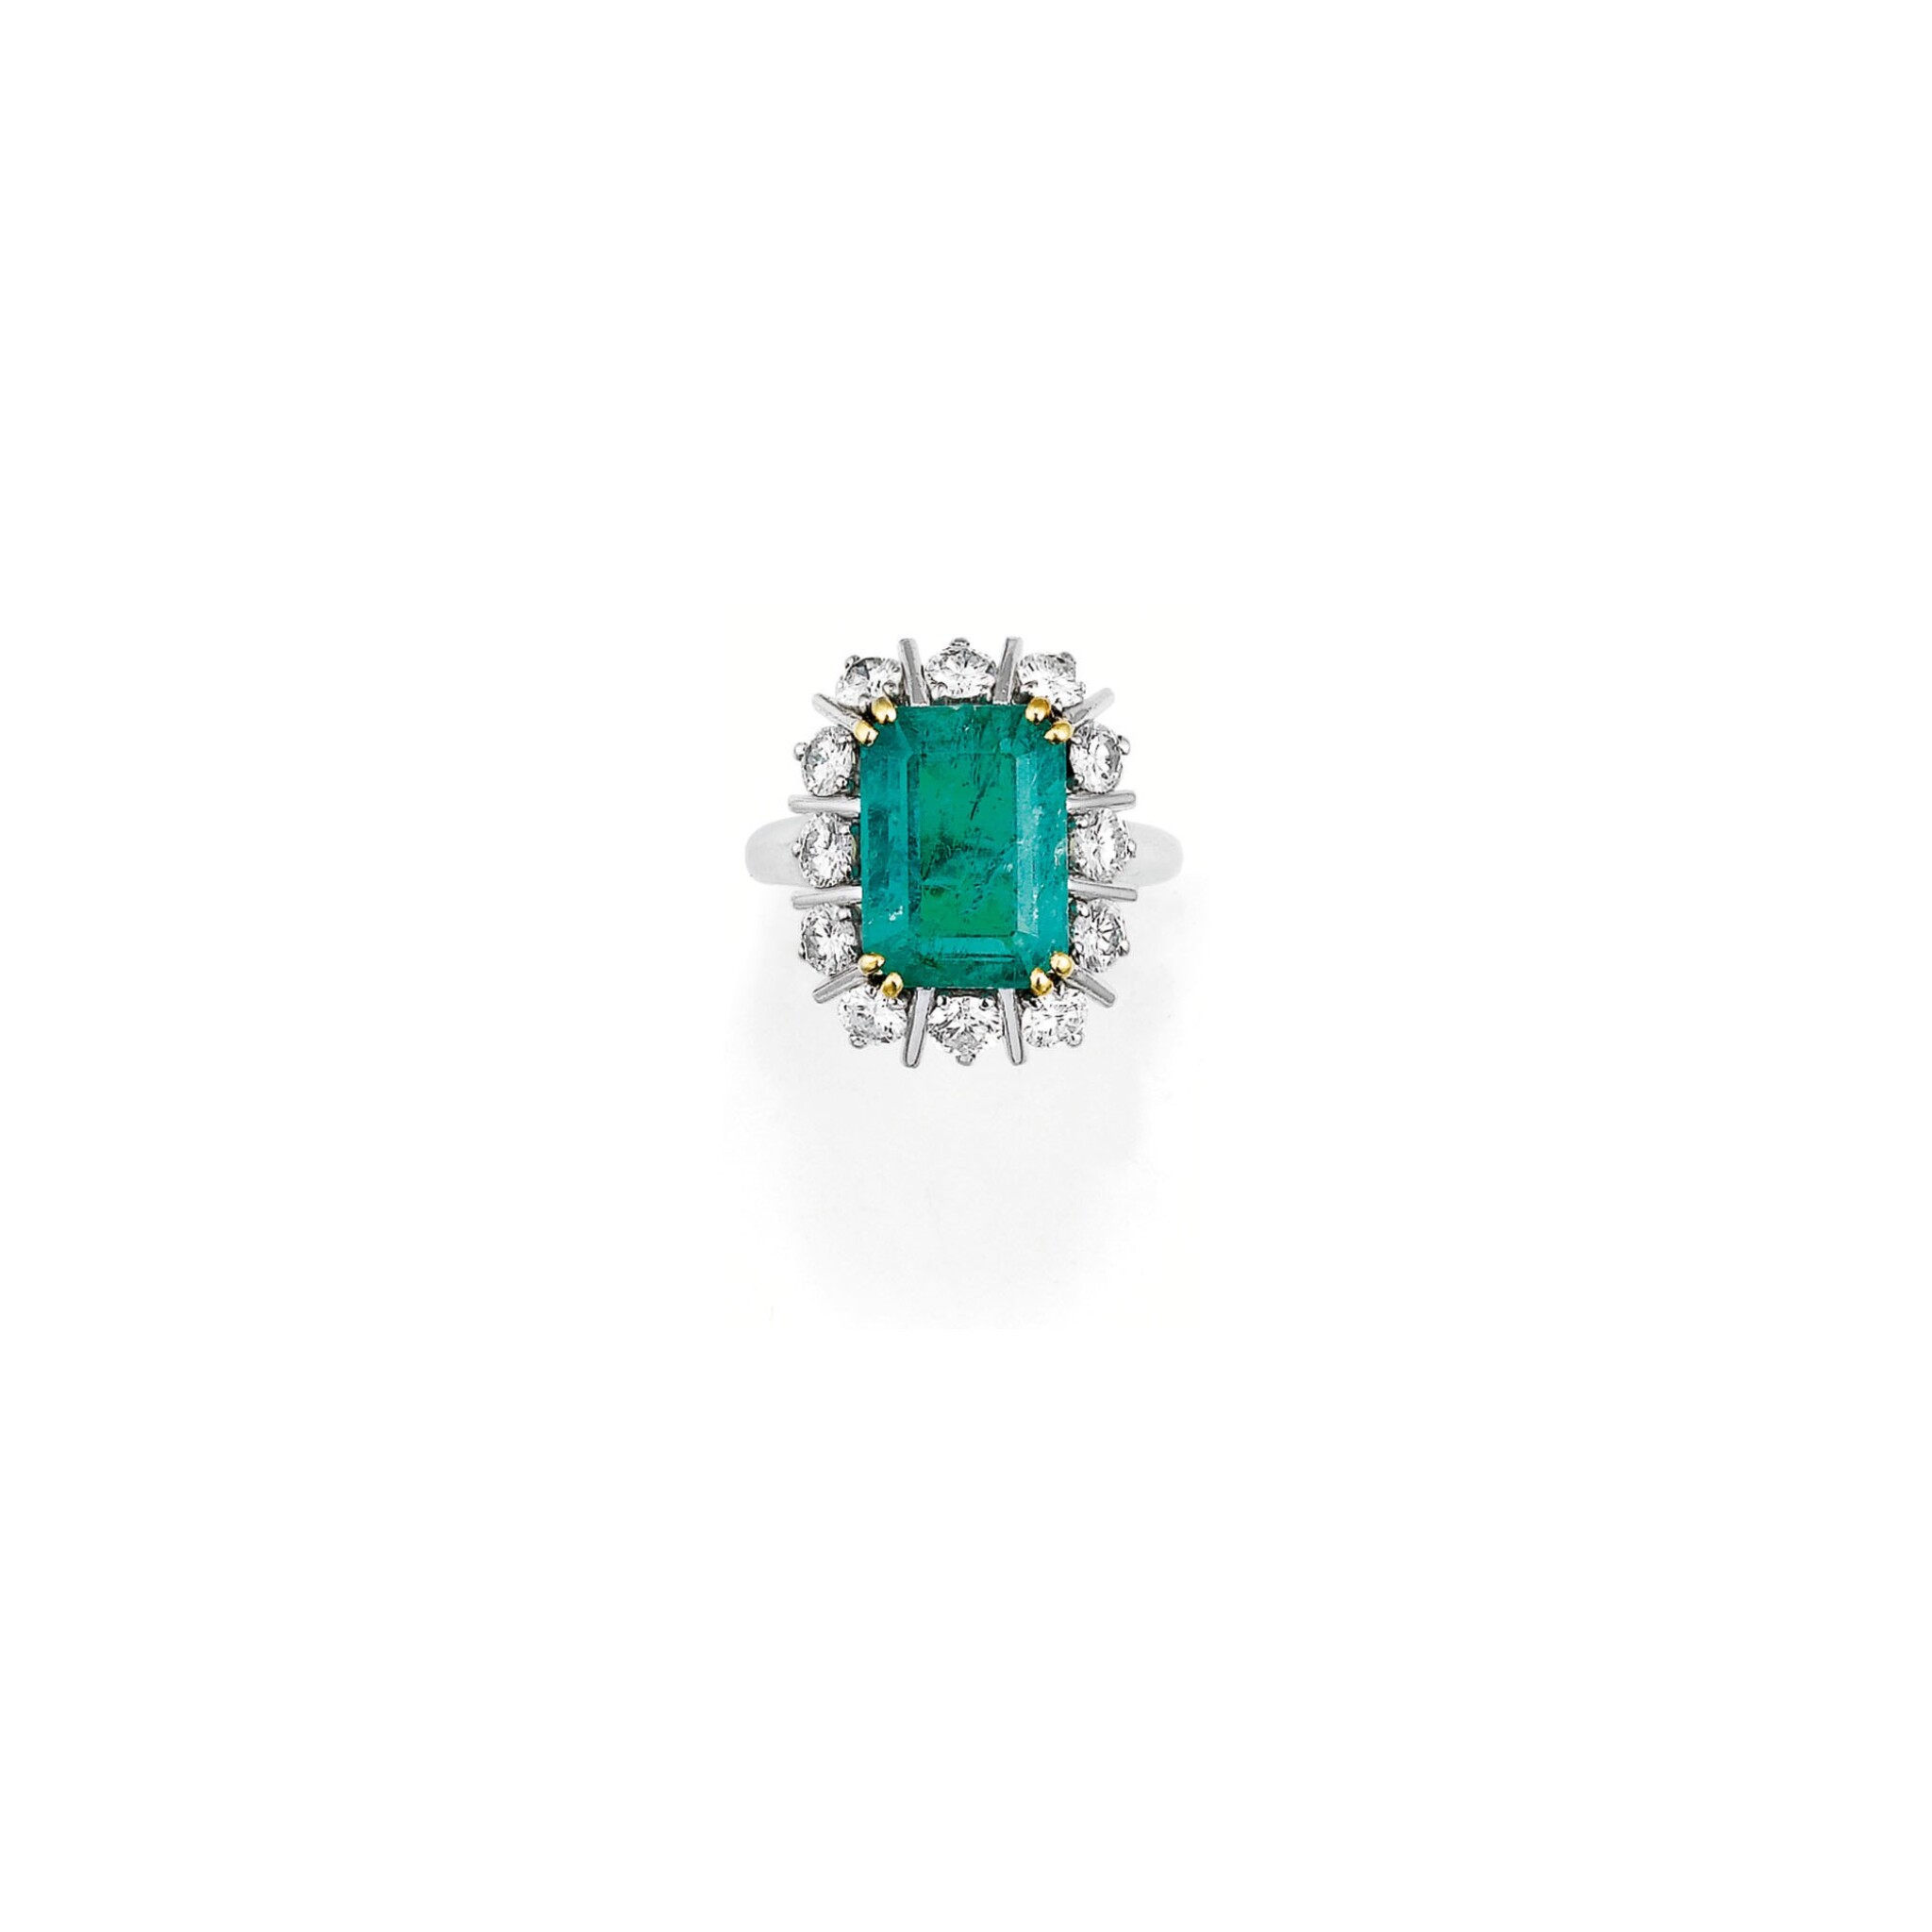 BAGUE ÉMERAUDE ET DIAMANTS, MAUBOUSSIN, VERS 1960 | EMERALD AND DIAMOND RING, MAUBOUSSIN, 1960S